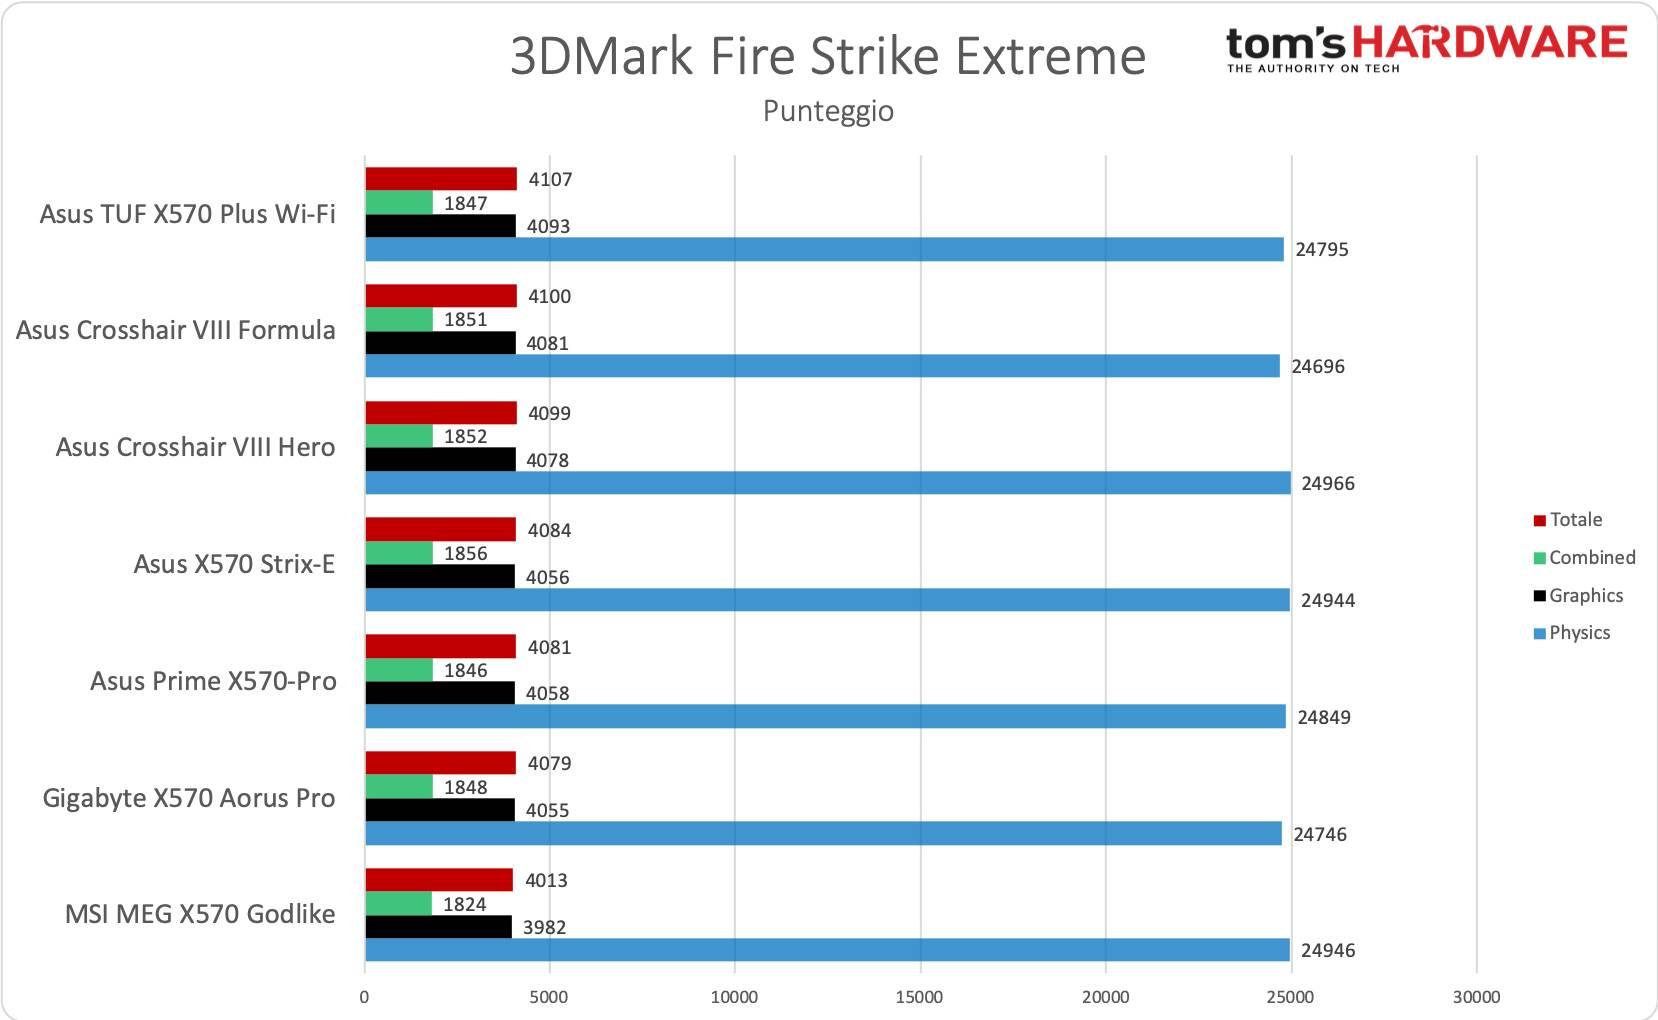 Asus TUF Gaming X570-Plus Wi-Fi - 3DMark FS Extreme